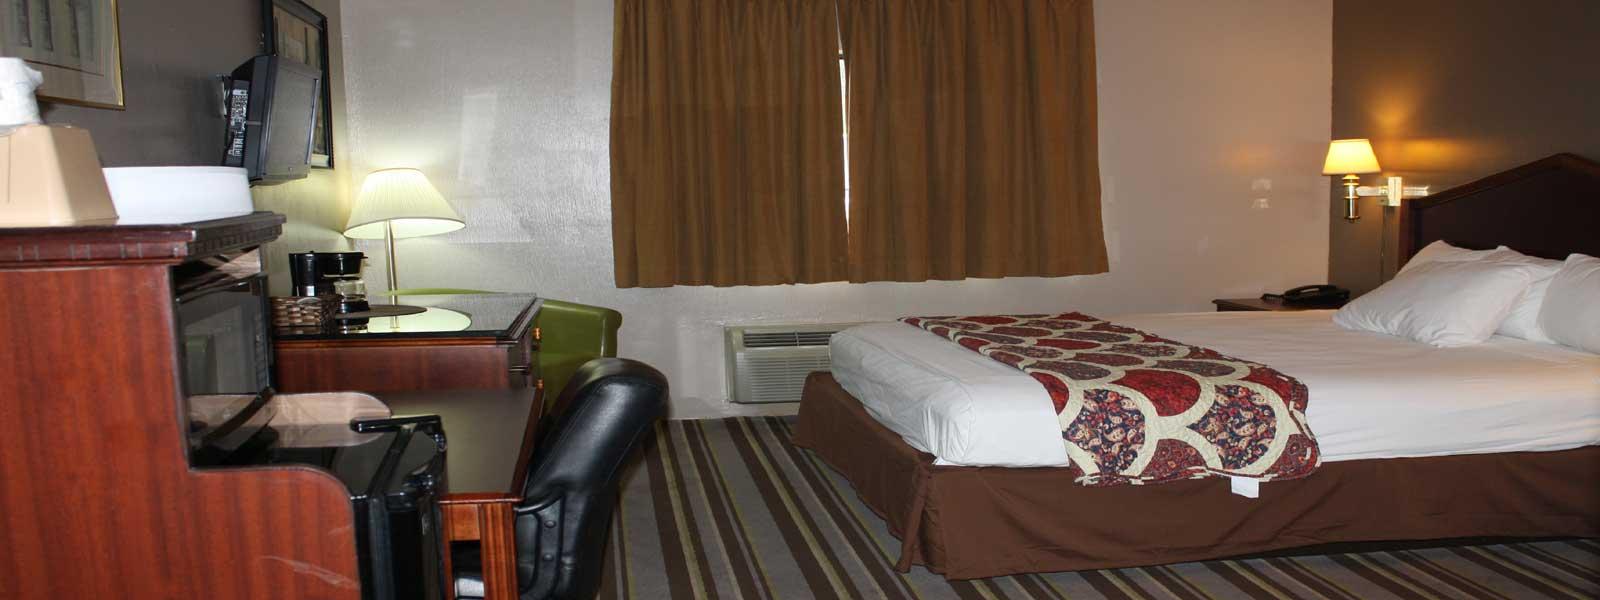 American Elite Inn Hazard Kentucky Ky Hotels Motels Accommodations